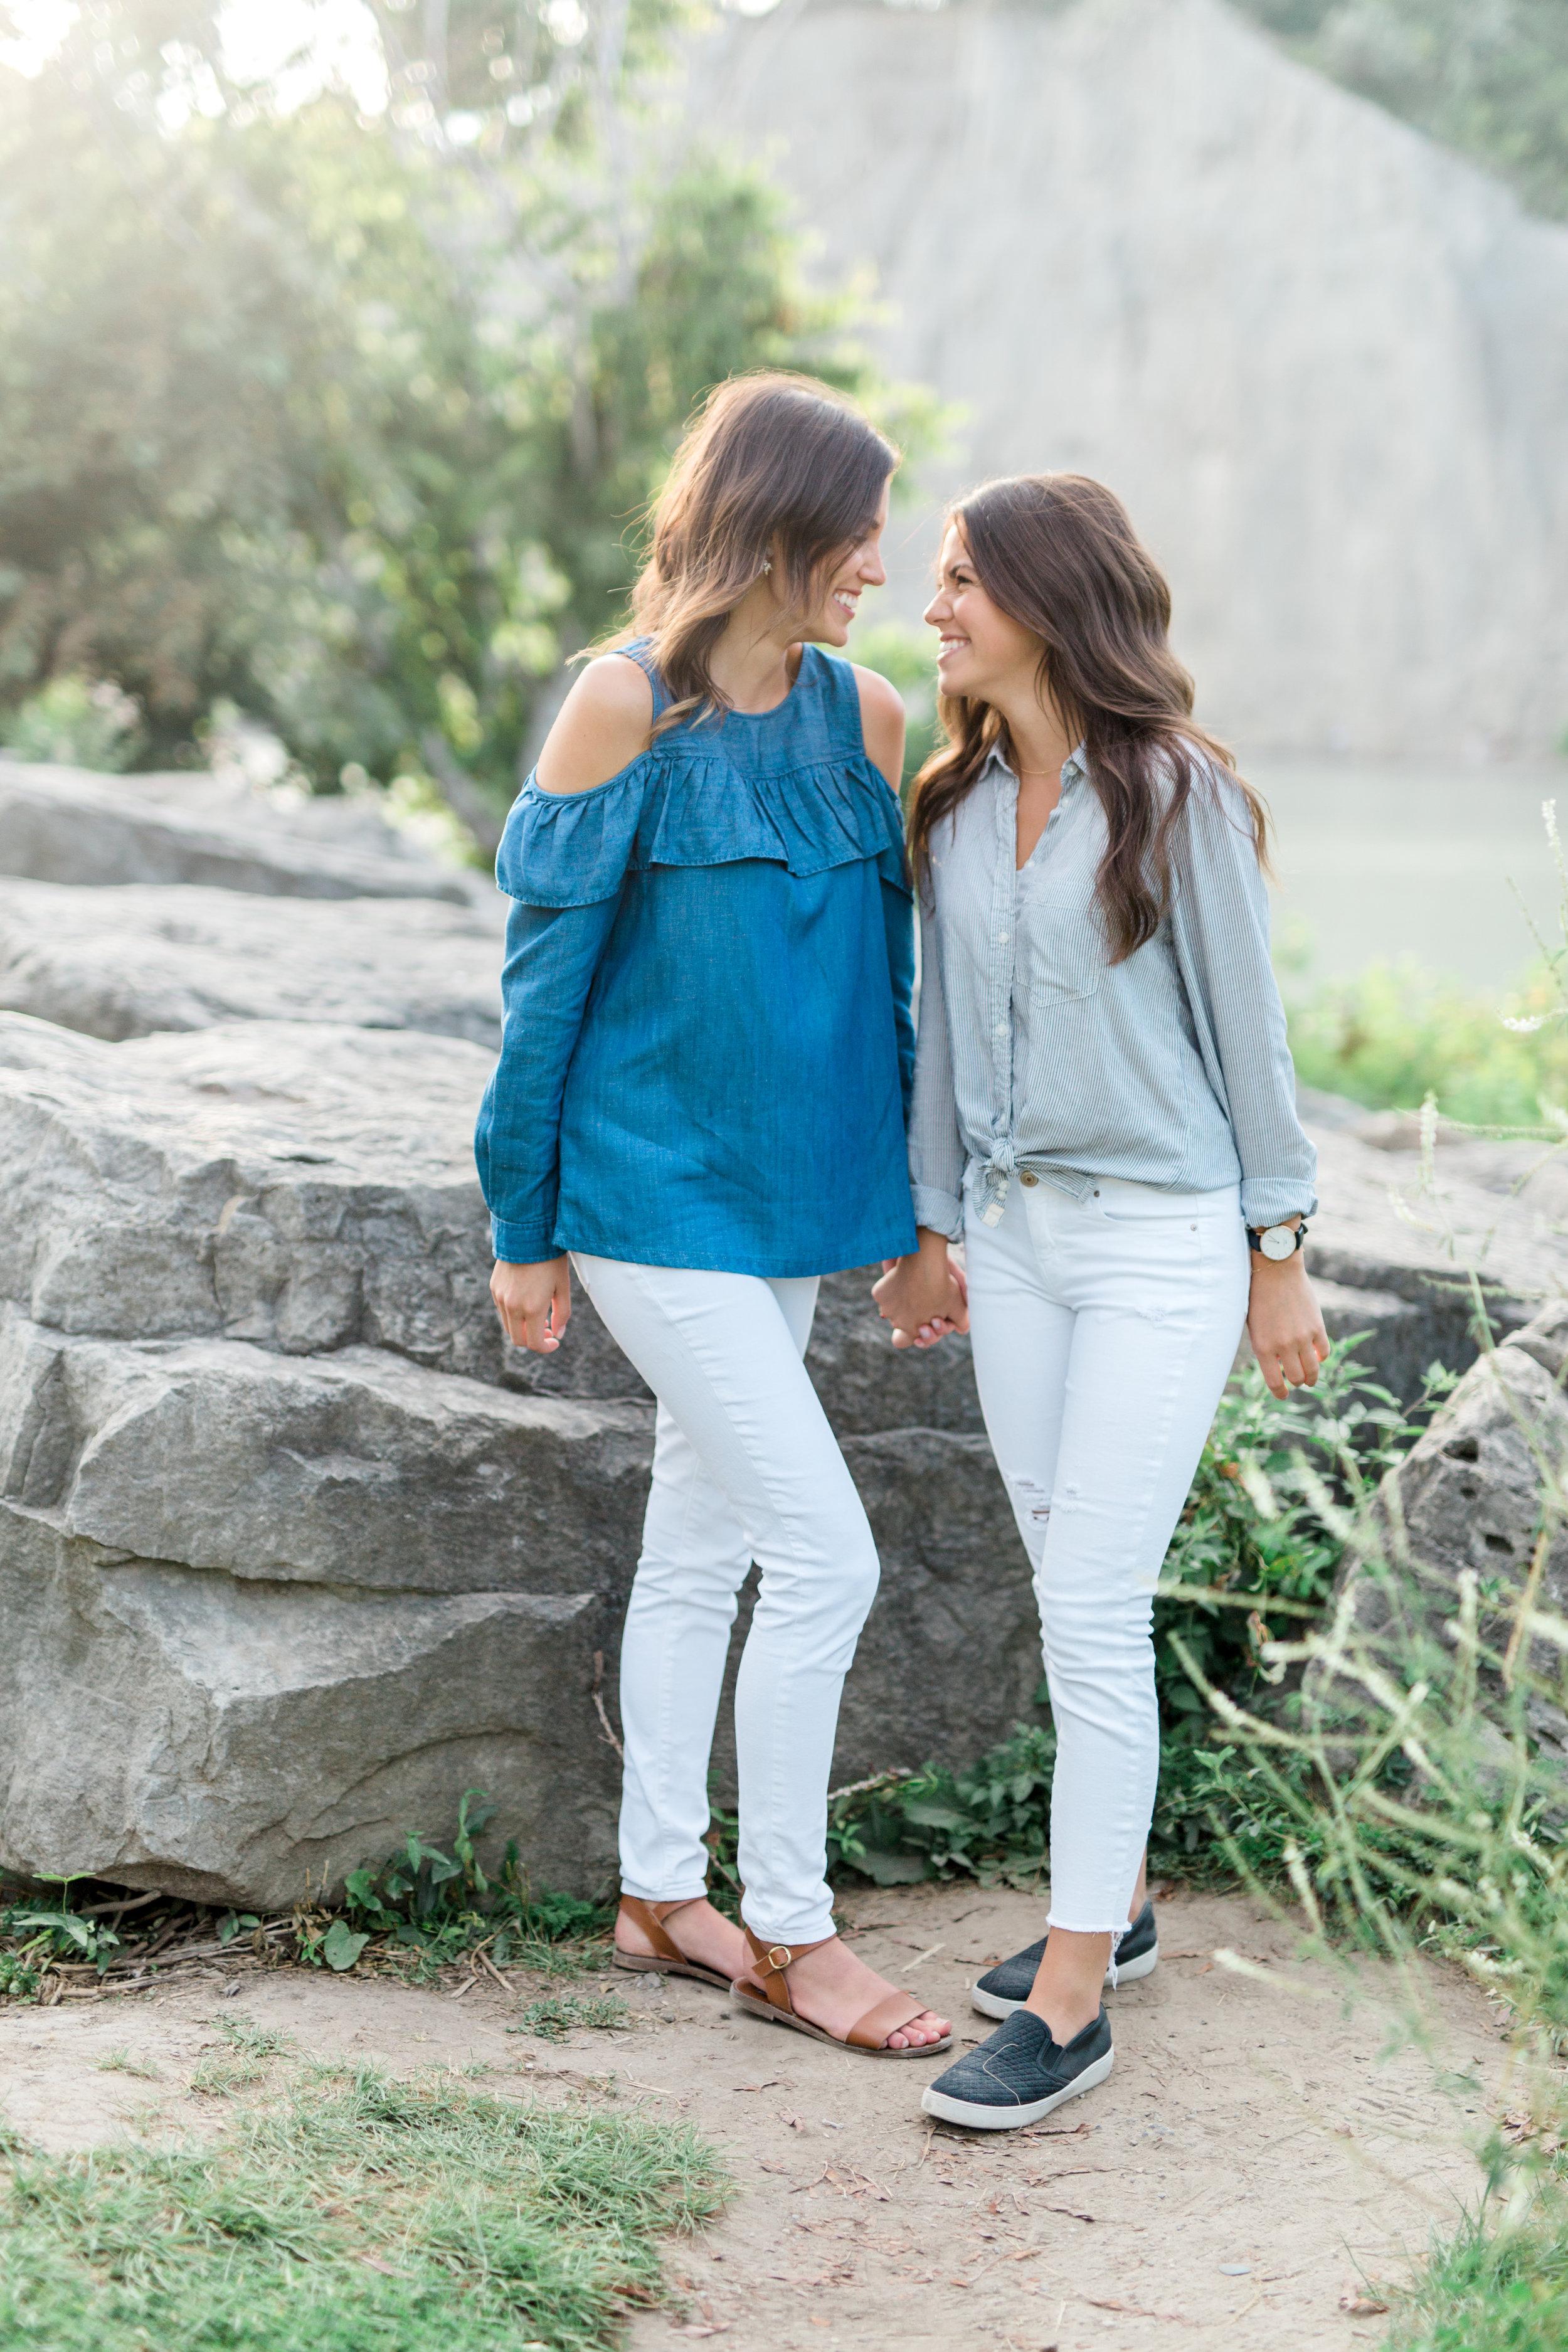 Danielle-Giroux-Amir-Golbazi-Genua-Family-Photography-Scarborough-Bluffs-8972.jpg